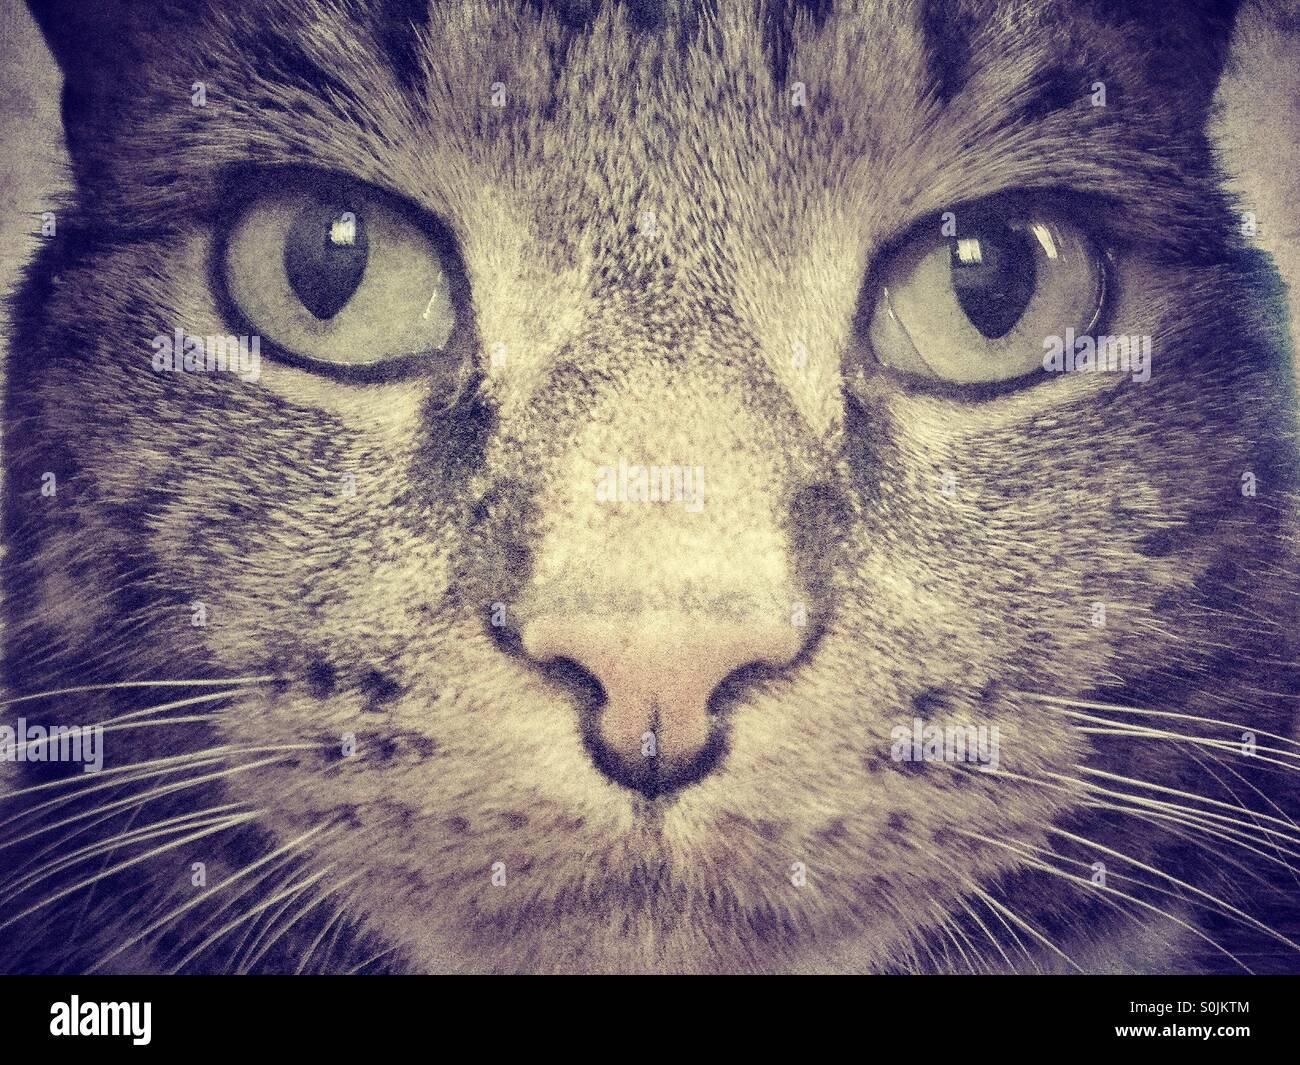 Tabby cat portrait. - Stock Image